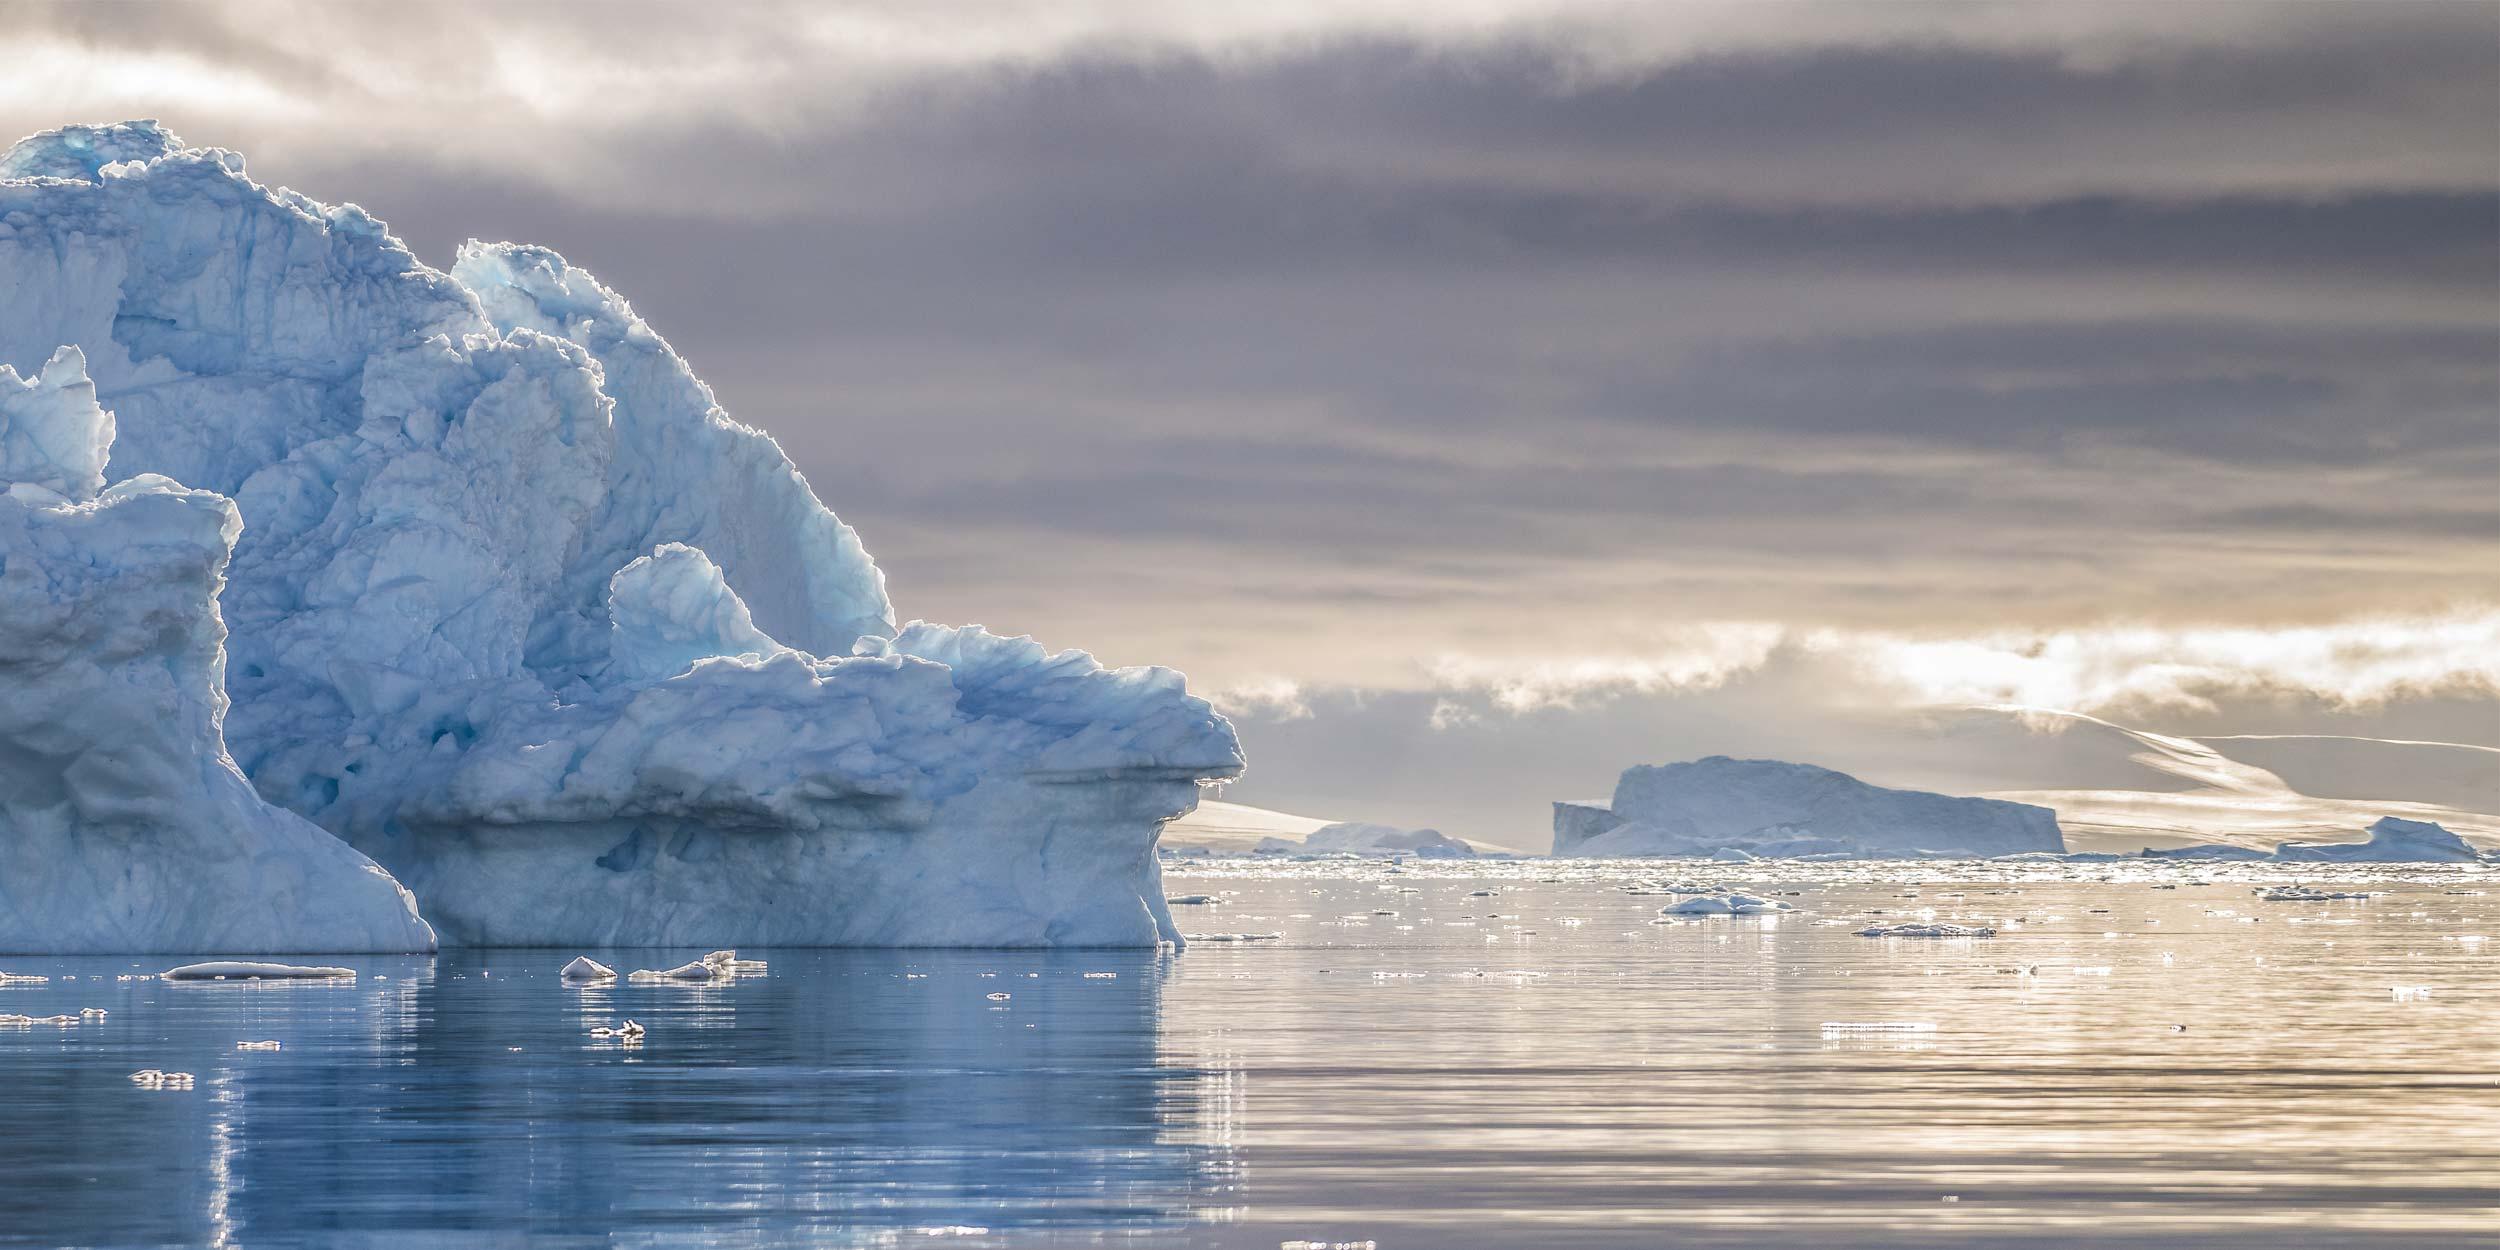 ����·������ Hurtigruten Cruise Line ��ҹ����� MS Midnatsol 17���ϼ����������� 2020-03-01����ŵ˹����˹��Buenos Aires���Ǵ� ���߱��:771836818